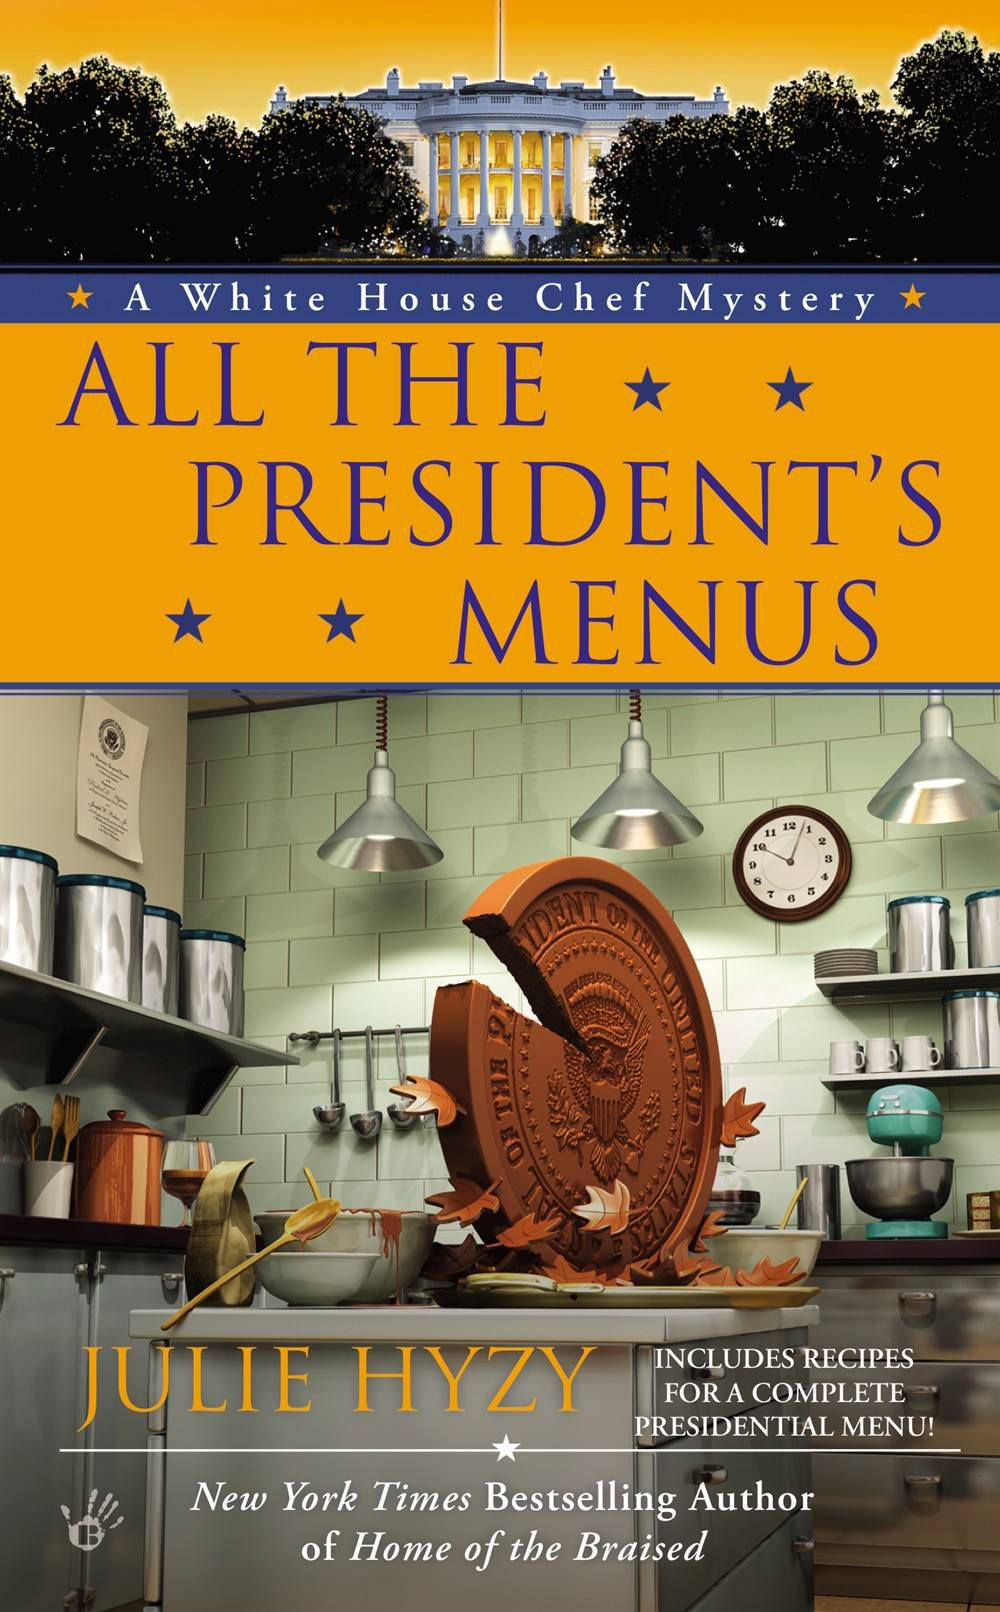 all the president's menus - julie hyzy